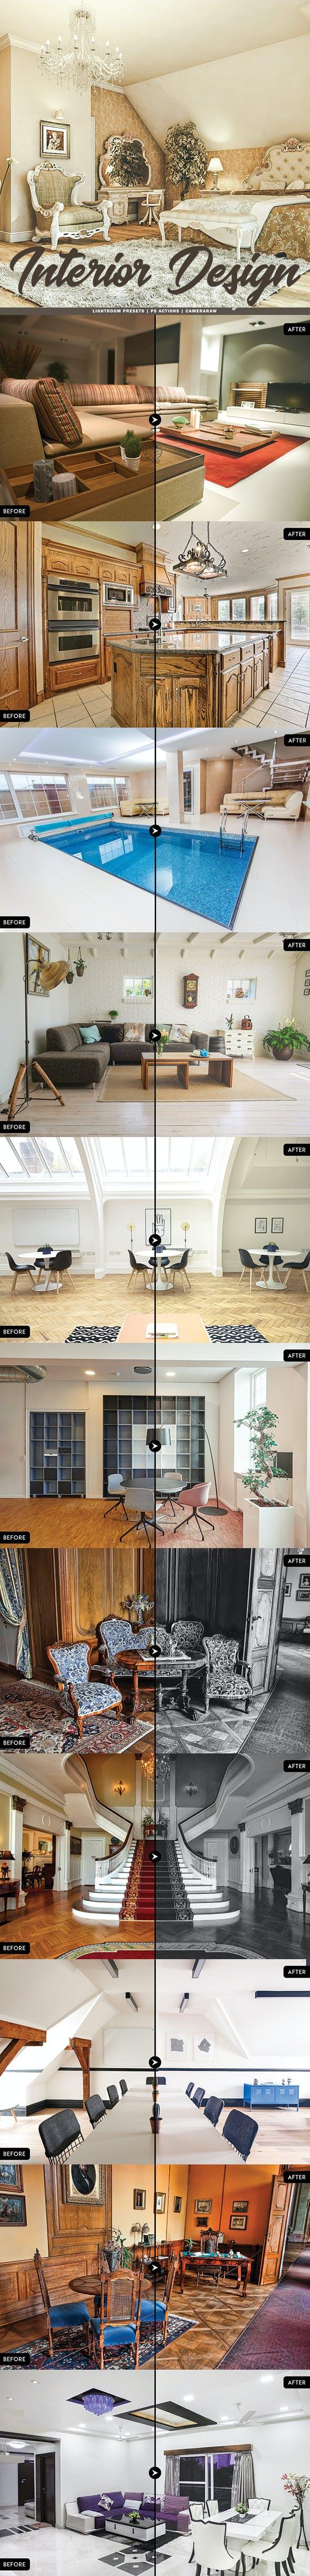 20 Interior Design Lightroom Presets